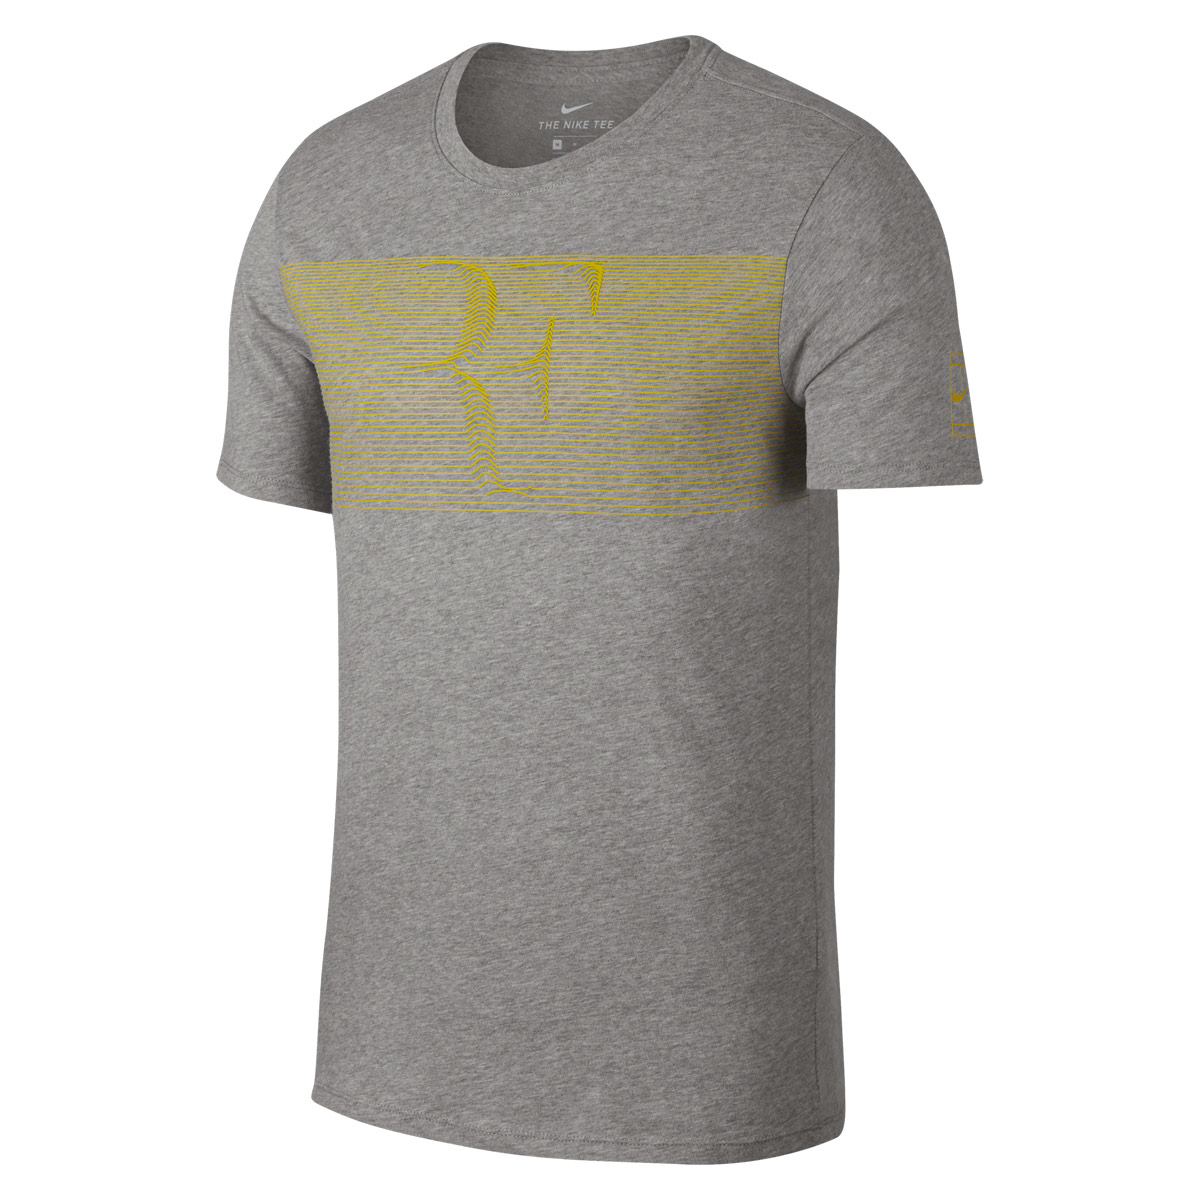 Roger Federer 2018 BNP Paribas Open Indian Wells RF Shirt - Roger Federer 2018 Indian Wells Nike Outfit